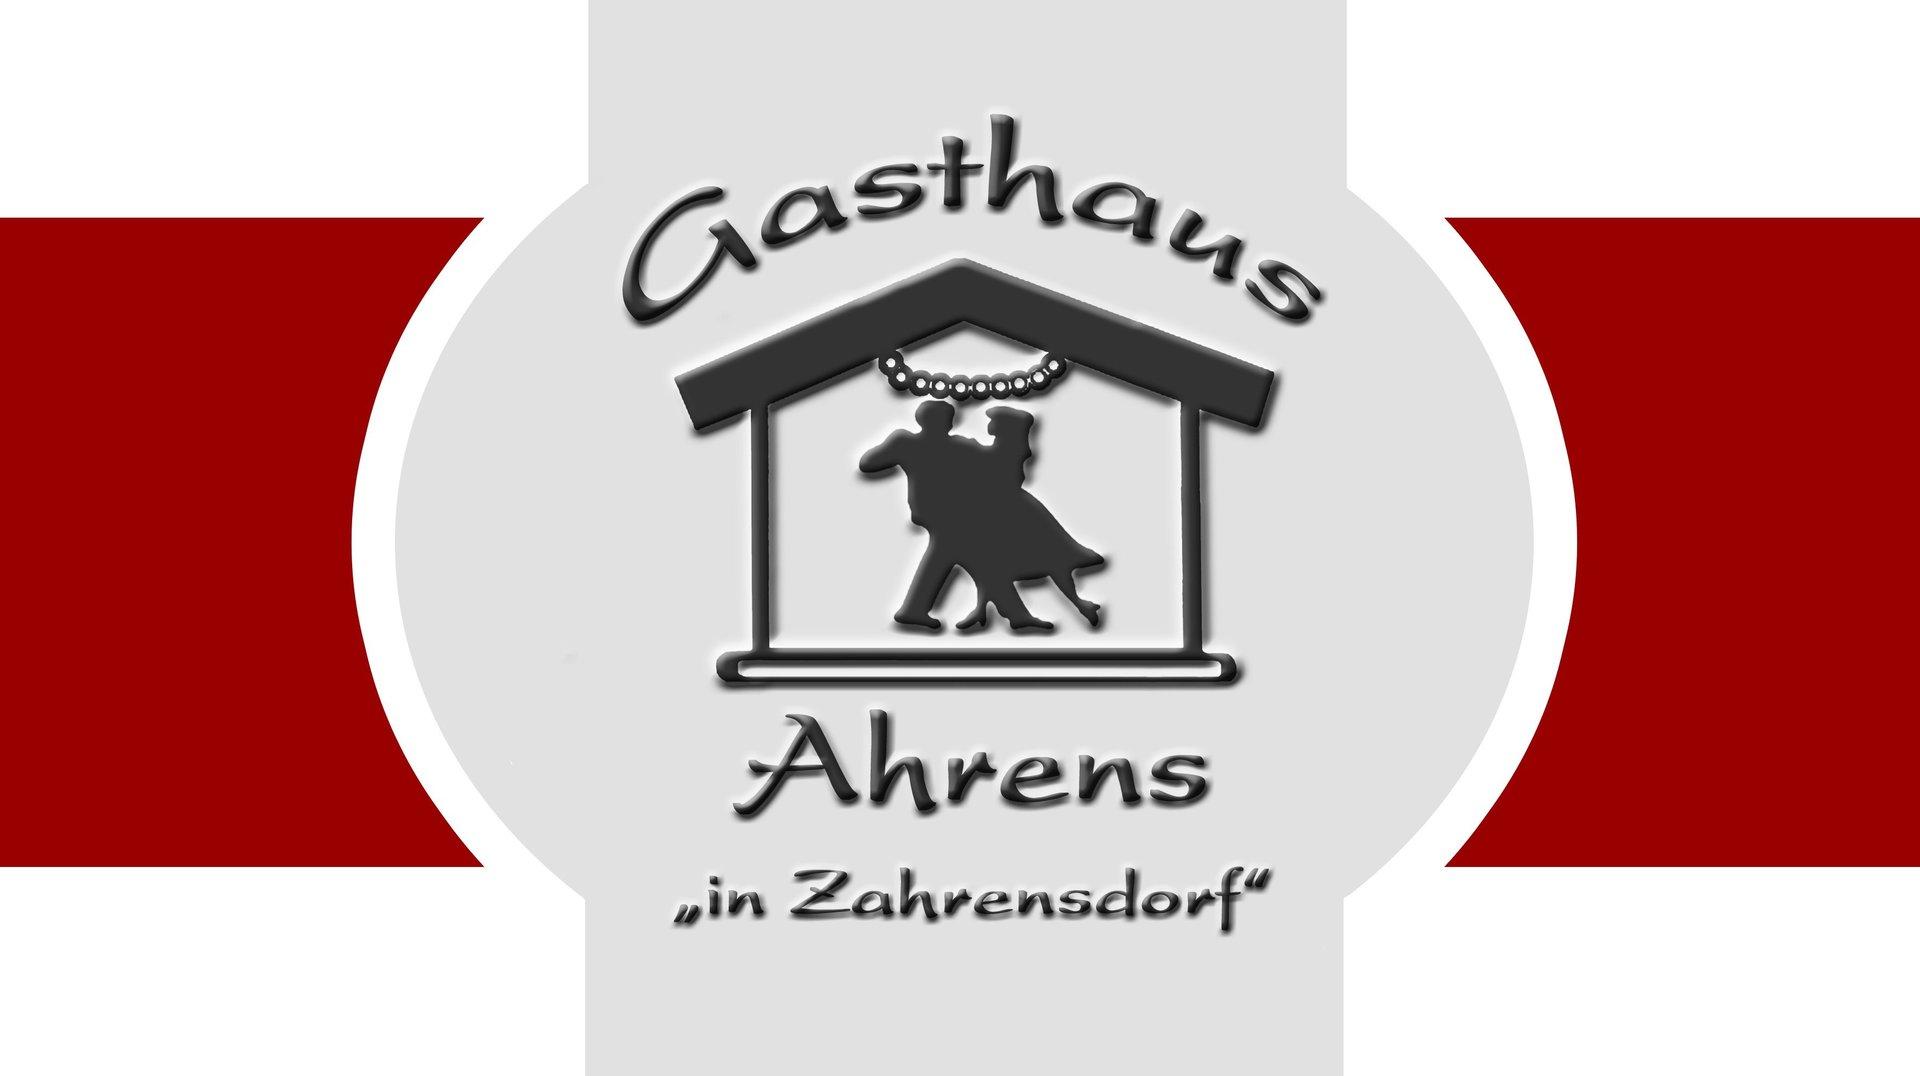 gasthaus ahrens zahrensdorf. Black Bedroom Furniture Sets. Home Design Ideas